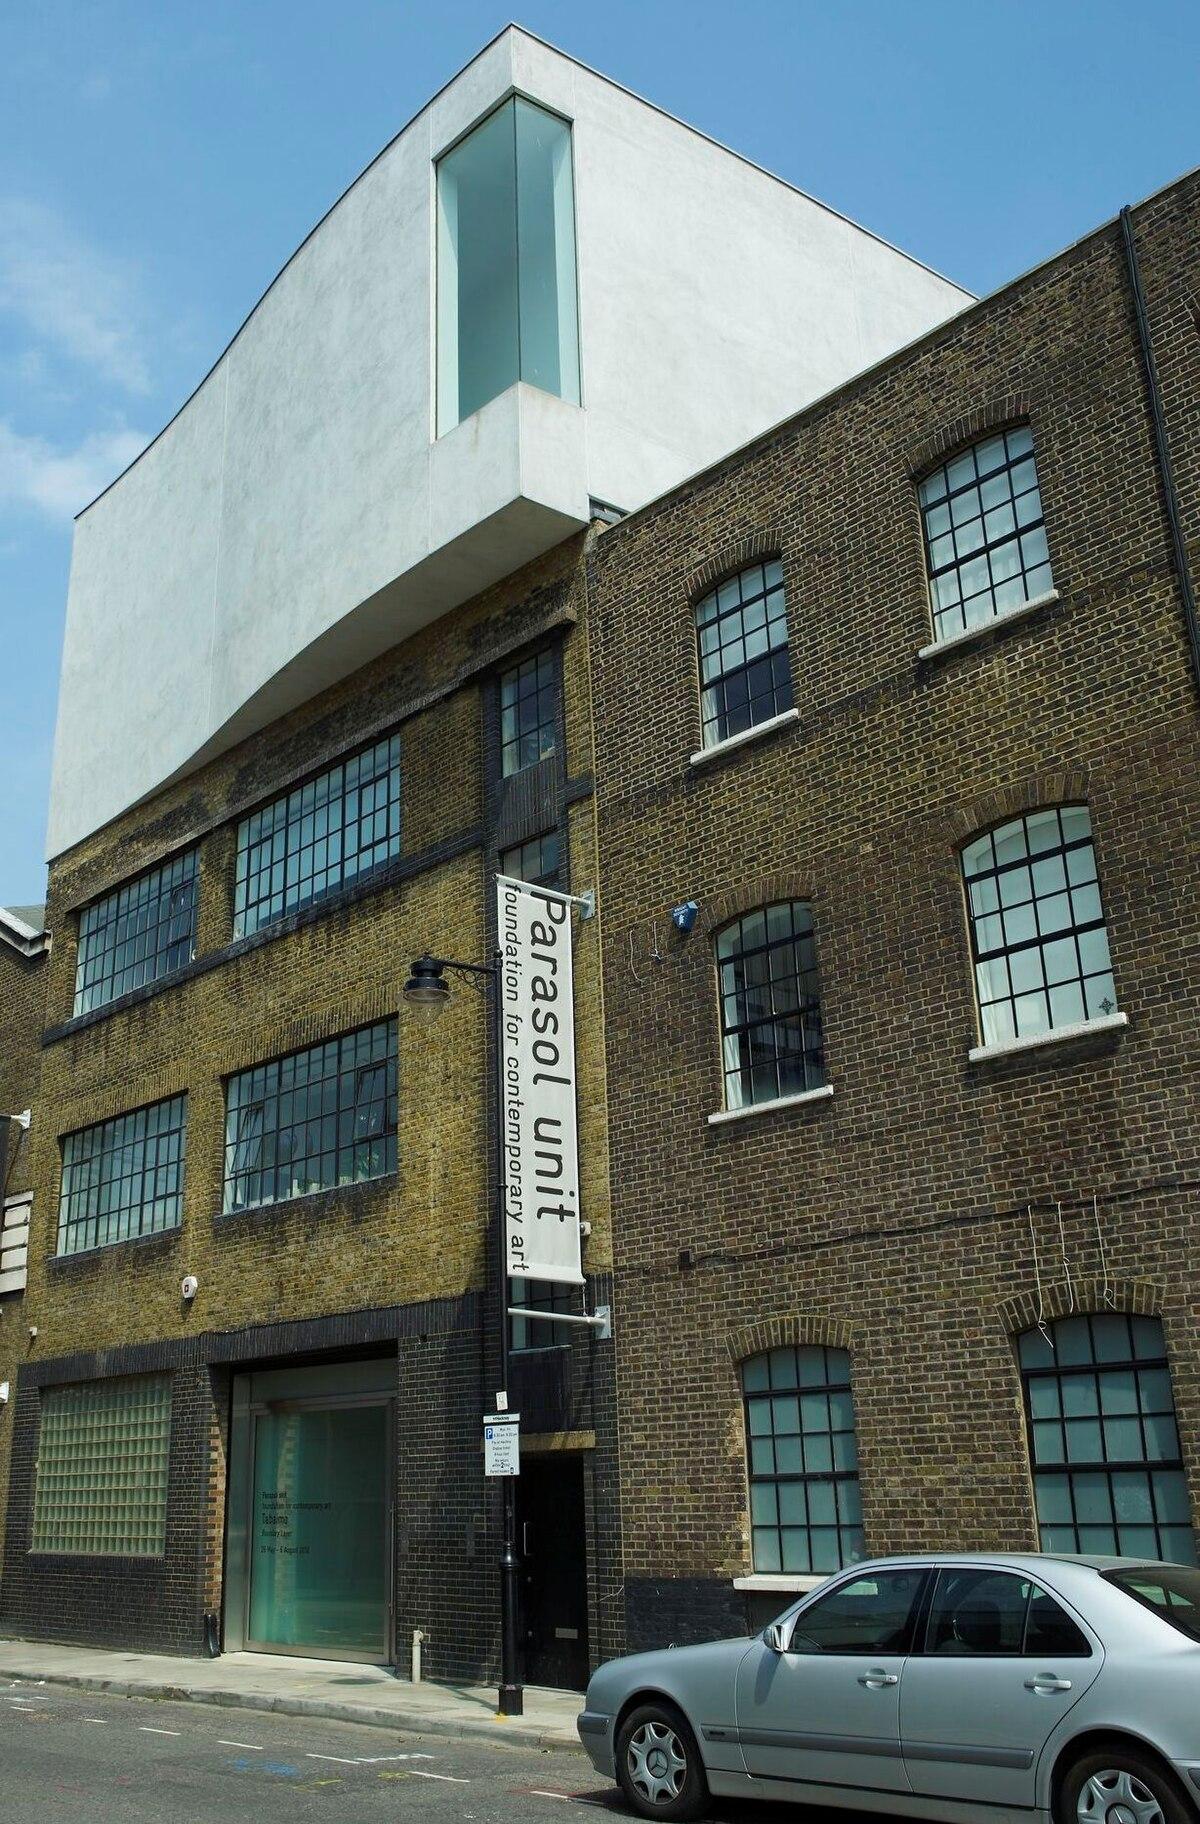 Parasol Unit Foundation For Contemporary Art Wikipedia